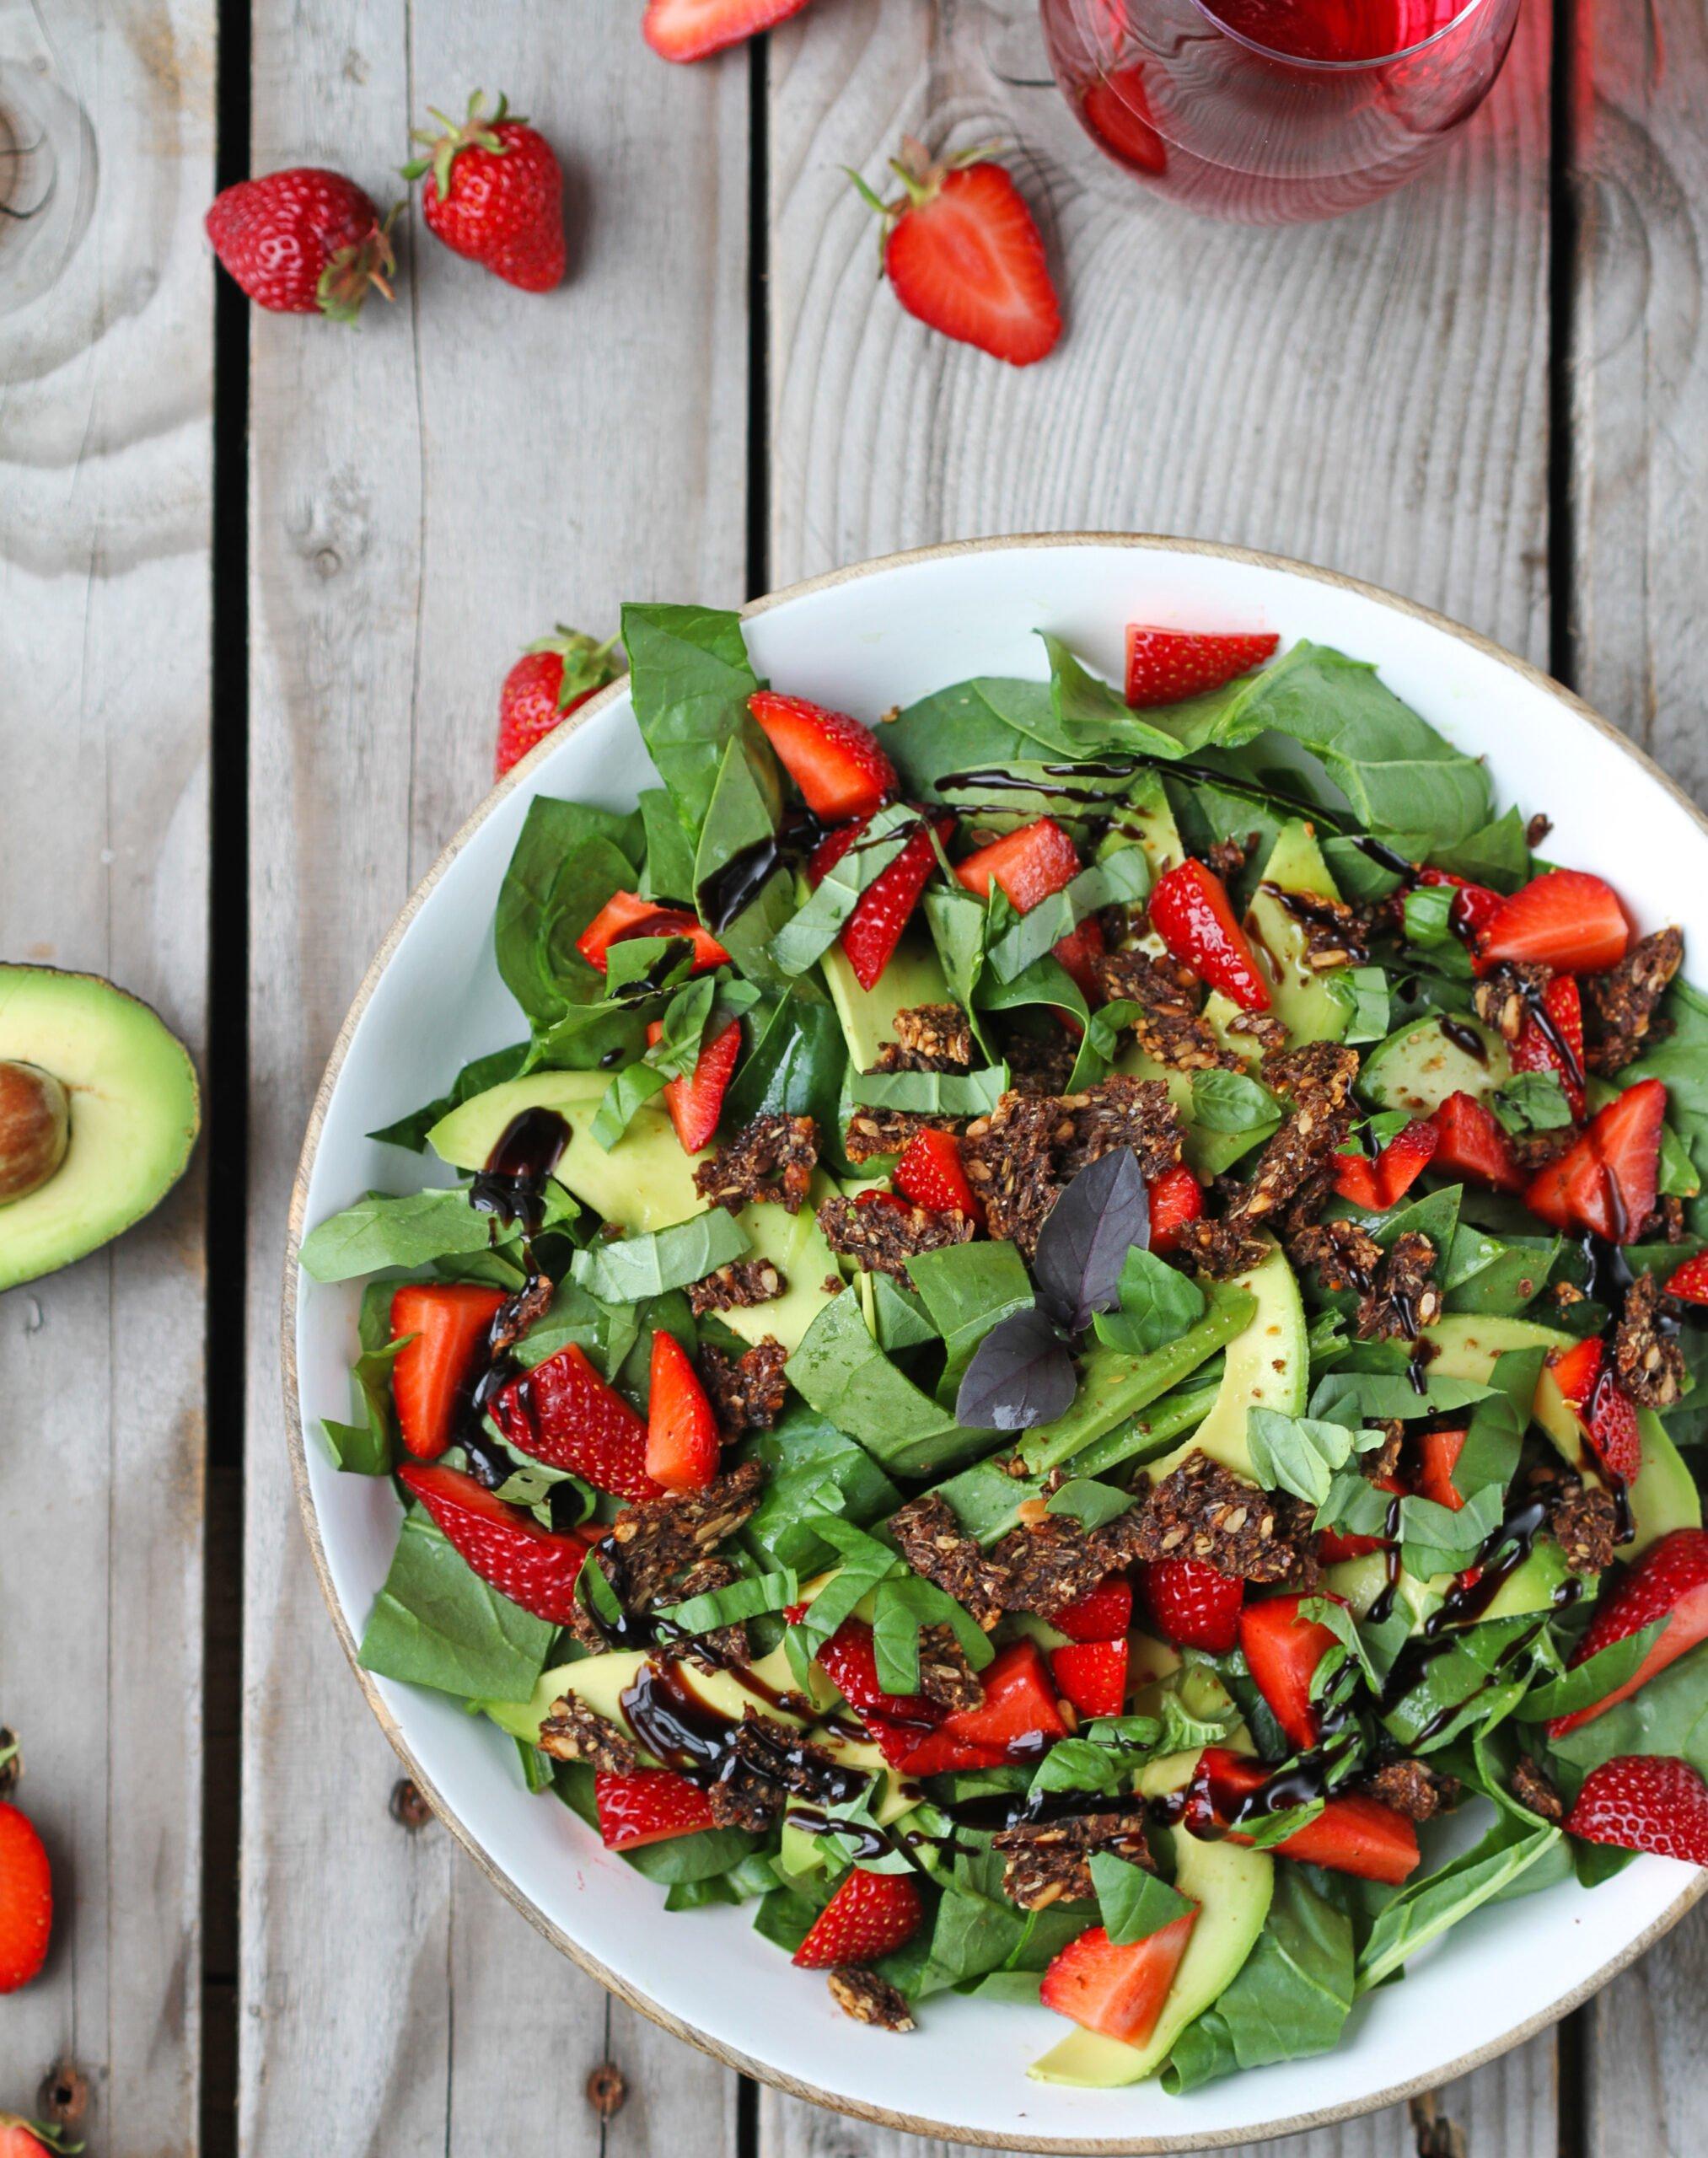 jordbaersalat scaled Jordbærsalat med spinat og avokado - en skøn sommer salat